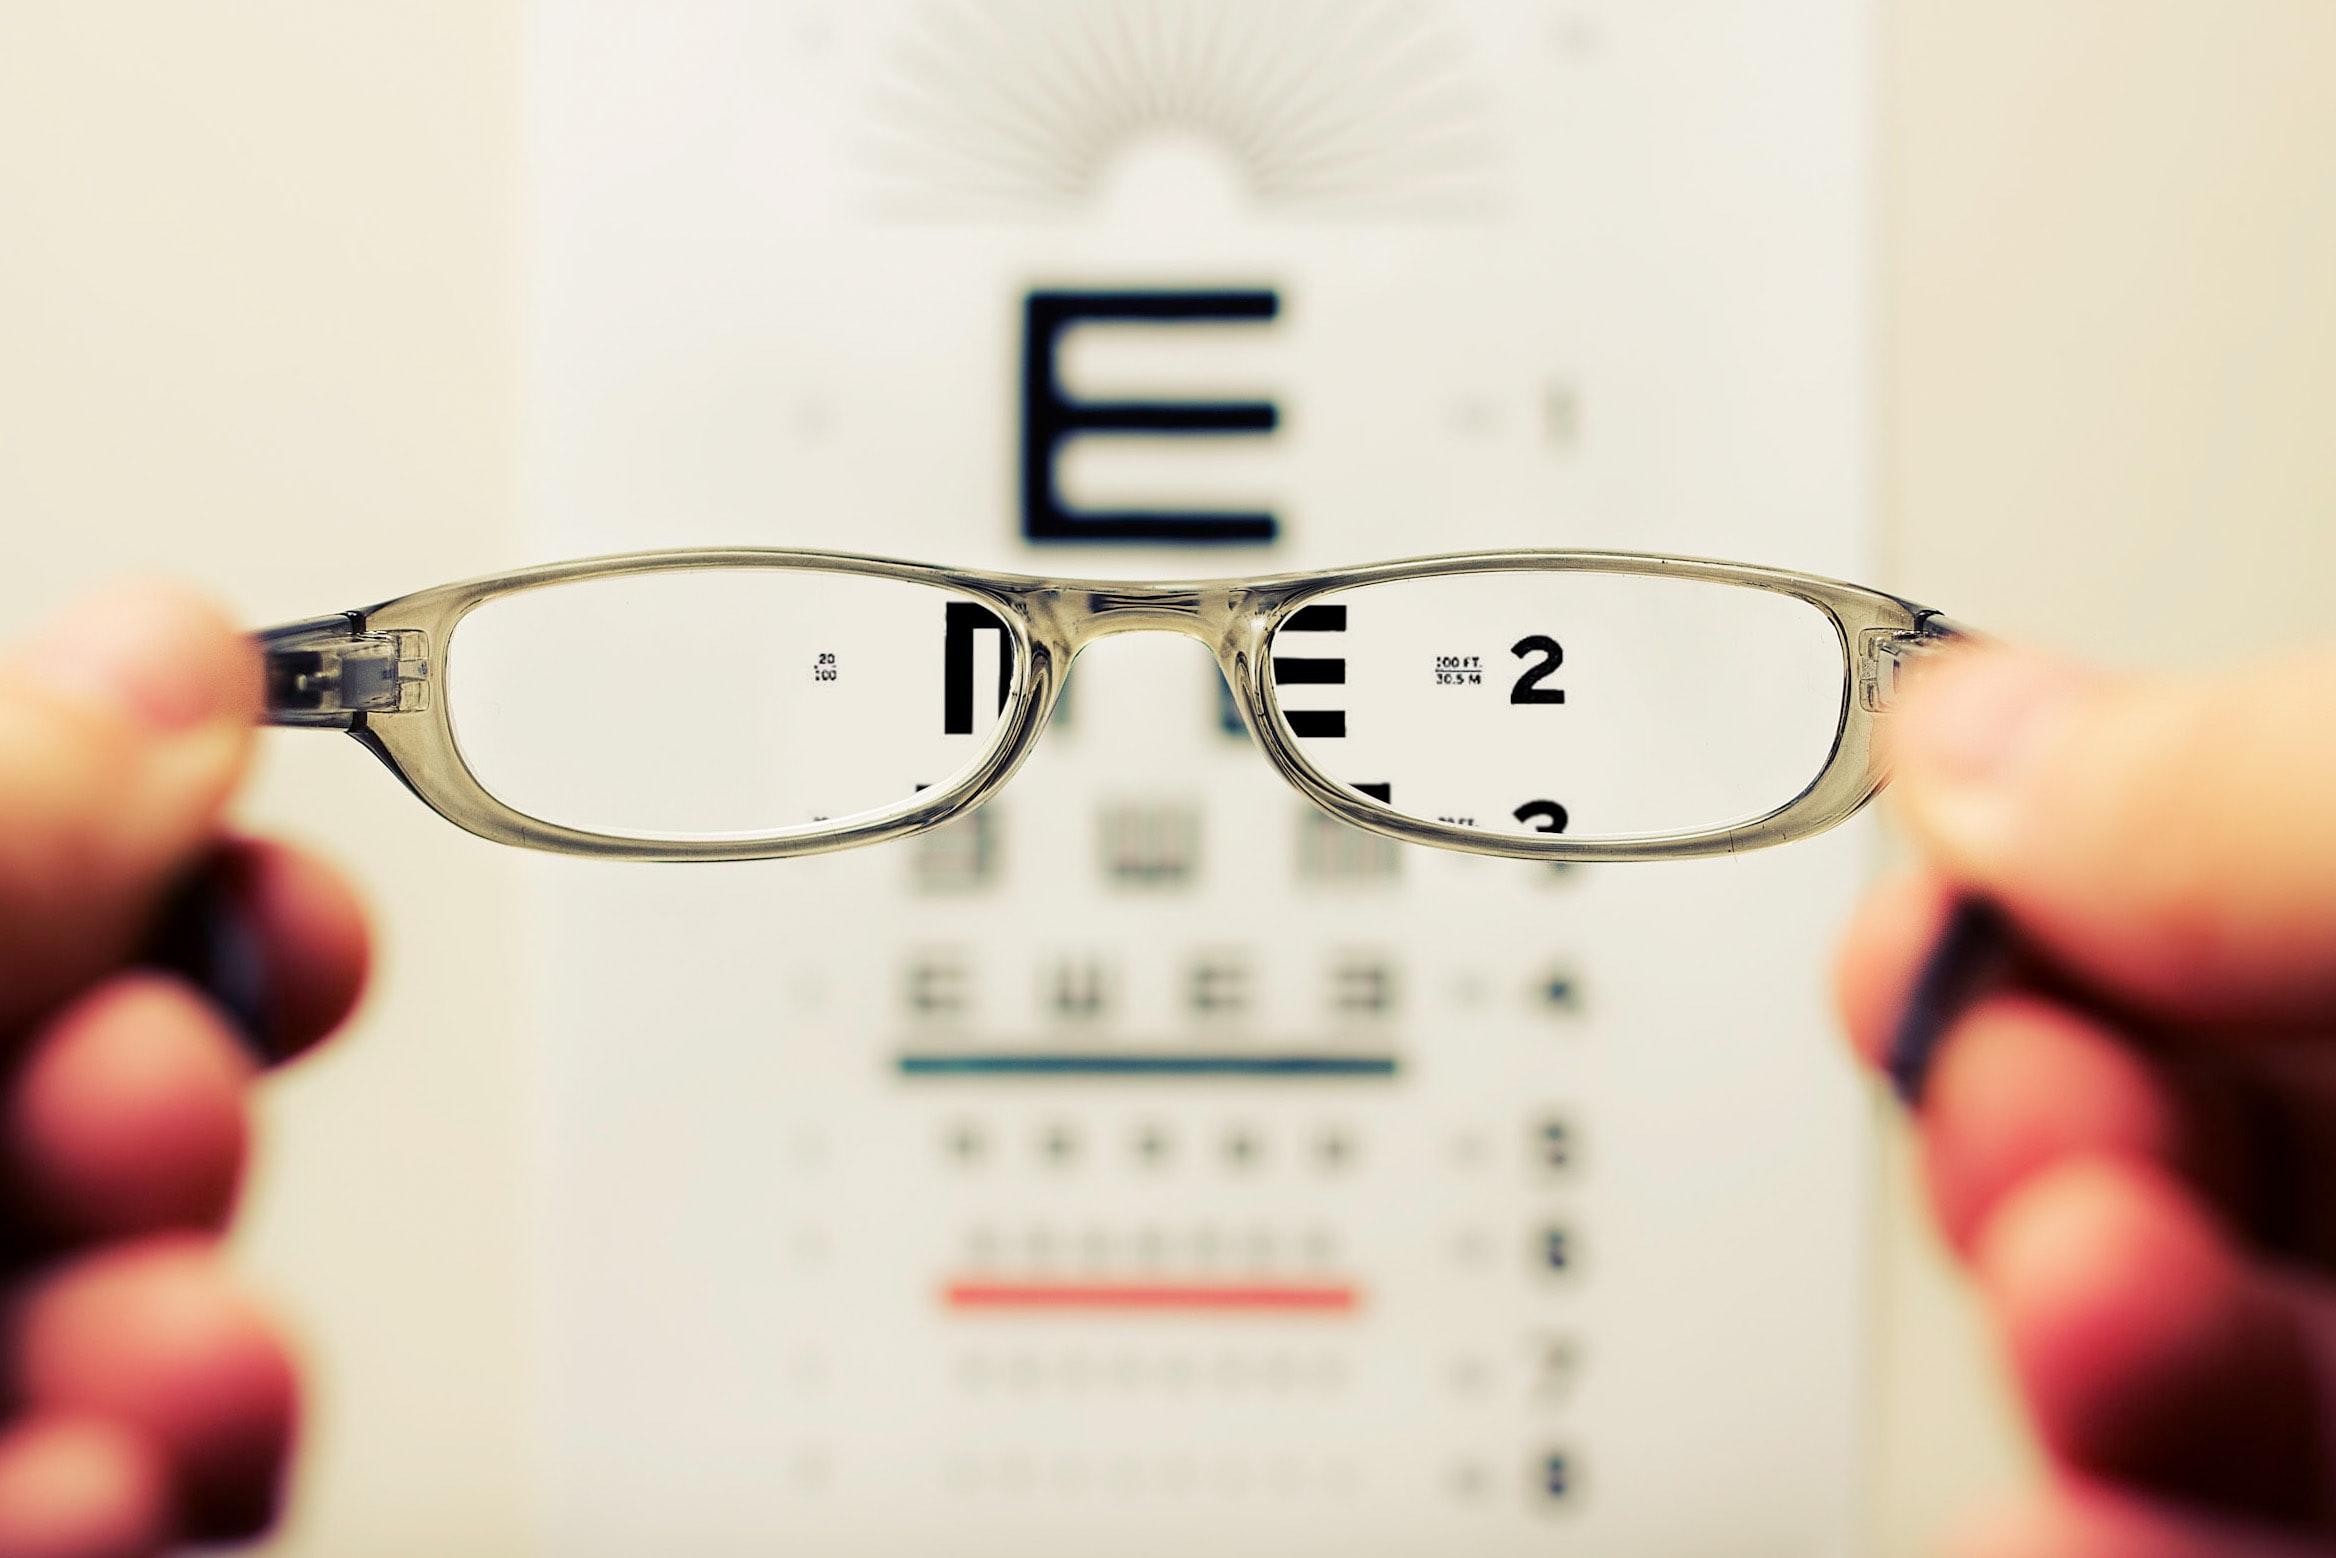 Having Diabetes and doing eye exams are key to keep good eyesight